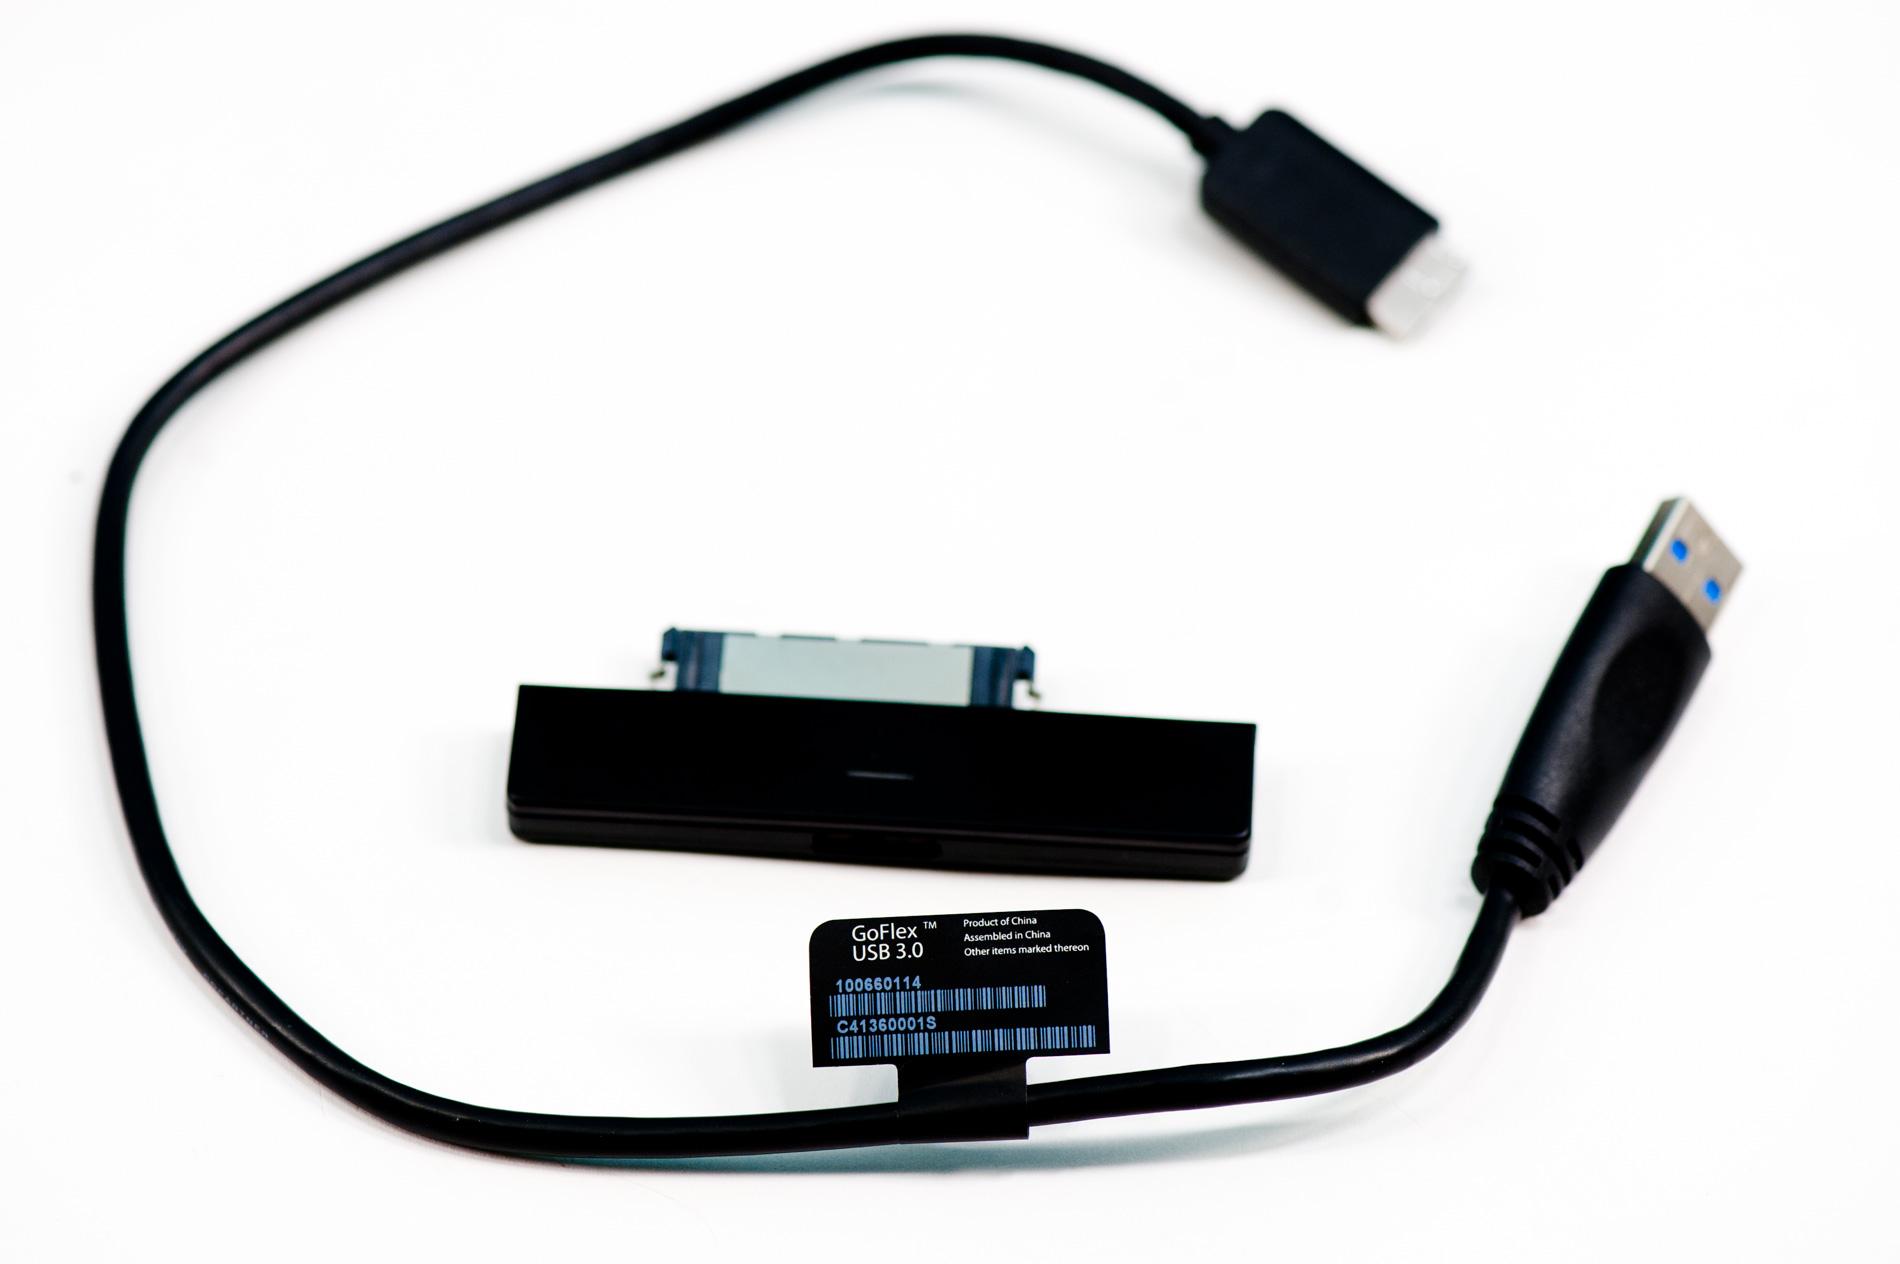 Seagate Goflex Desk Adapter Usb 3 0 Not Working Hostgarcia